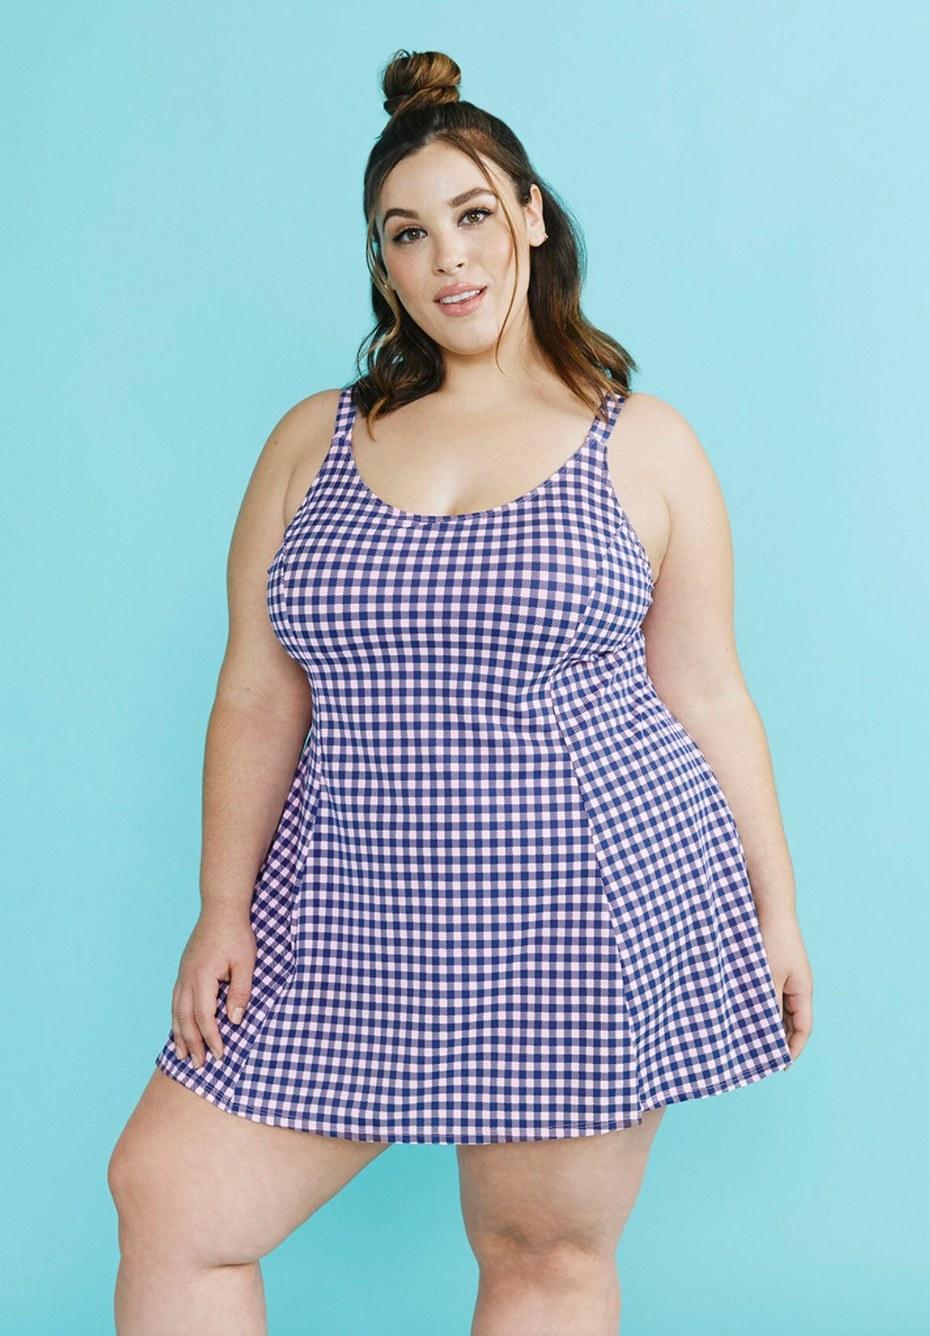 The swim dress in gingham